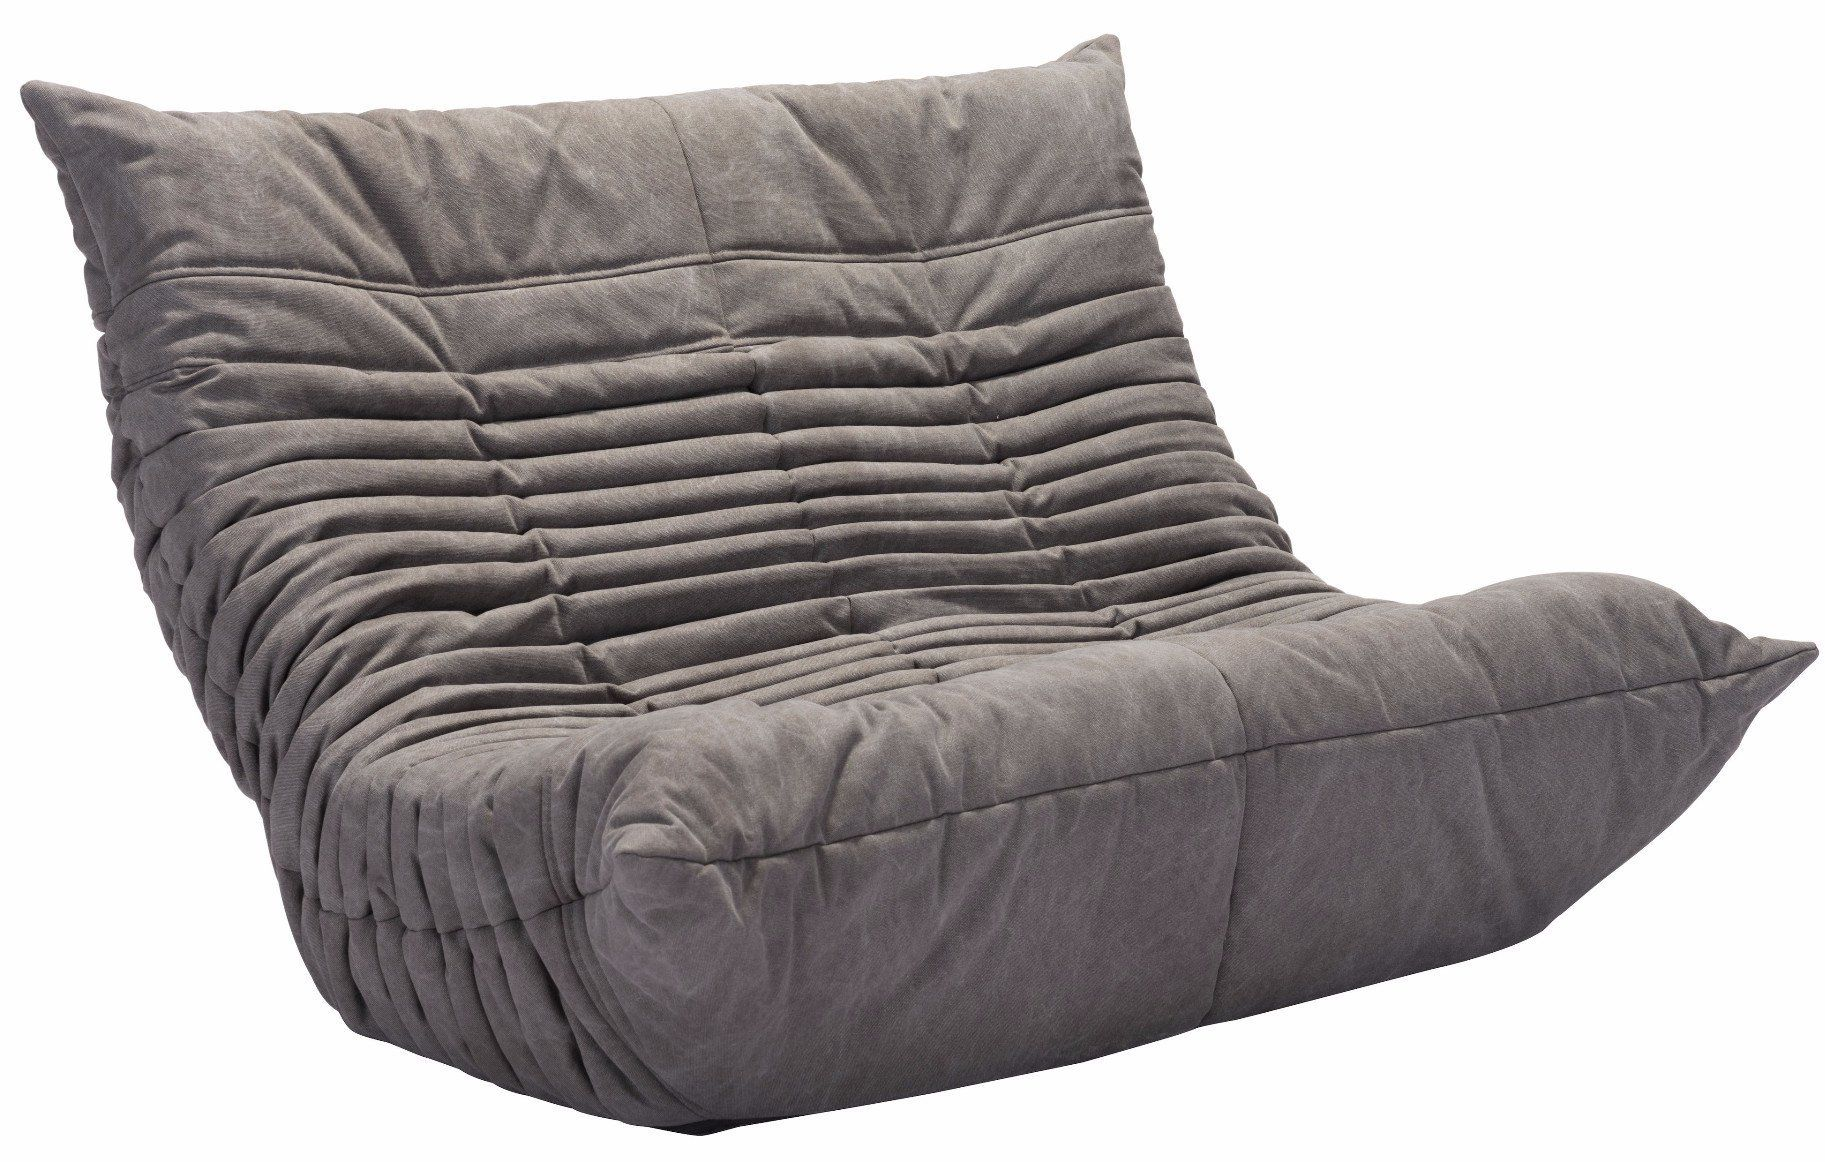 Phenomenal Jetson Ii Apartment Size Sofa Grey Apt2B Apartment Ideas Short Links Chair Design For Home Short Linksinfo